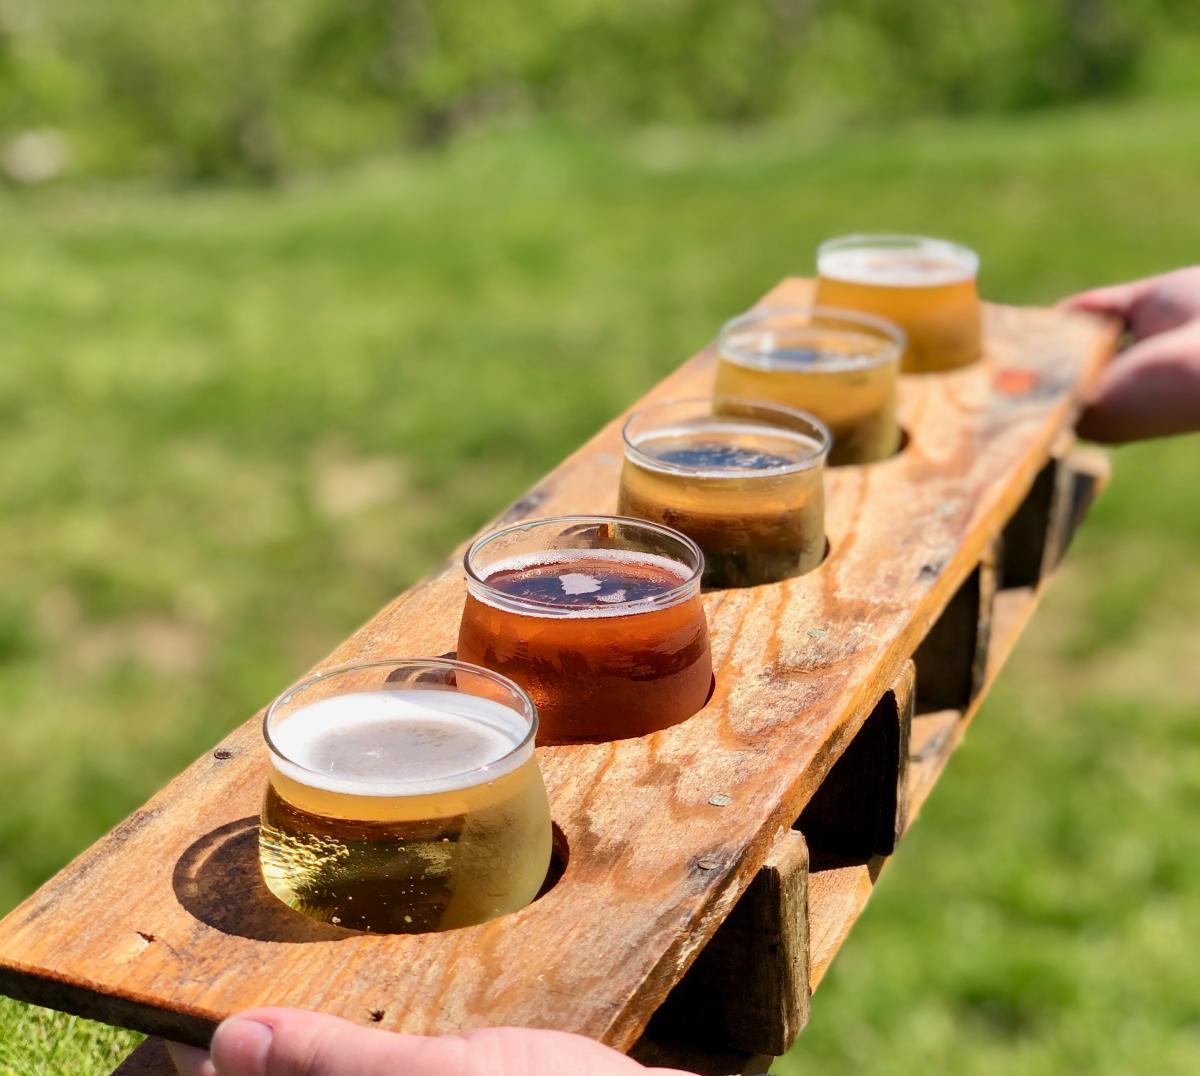 Townline Cider